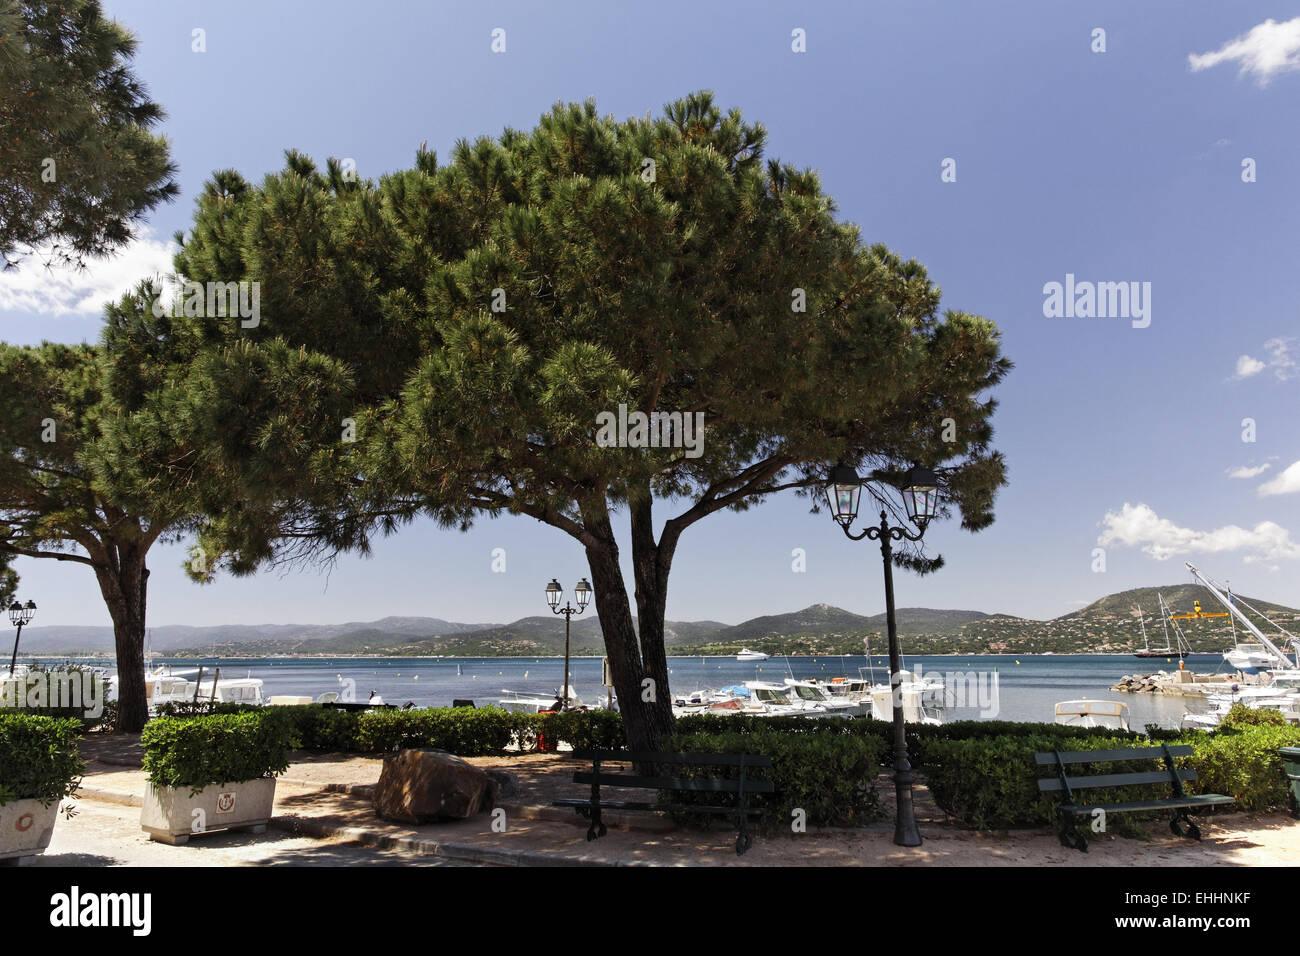 Pinus halepensis, Aleppo Pine, Jerusalem pine - Stock Image